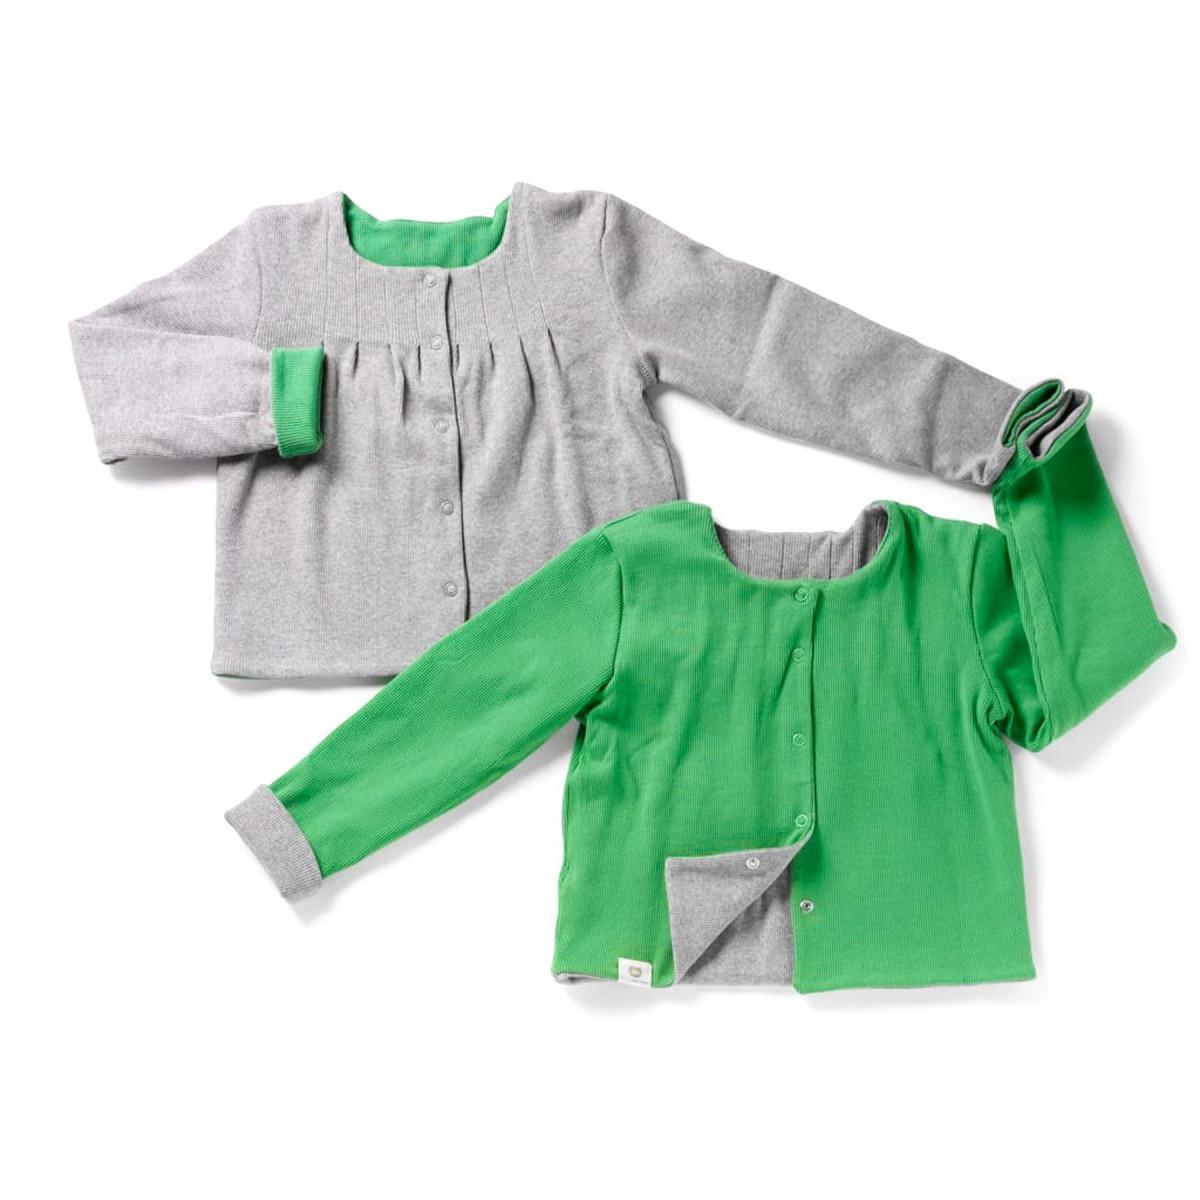 Joseph, le cardigan vert & gris